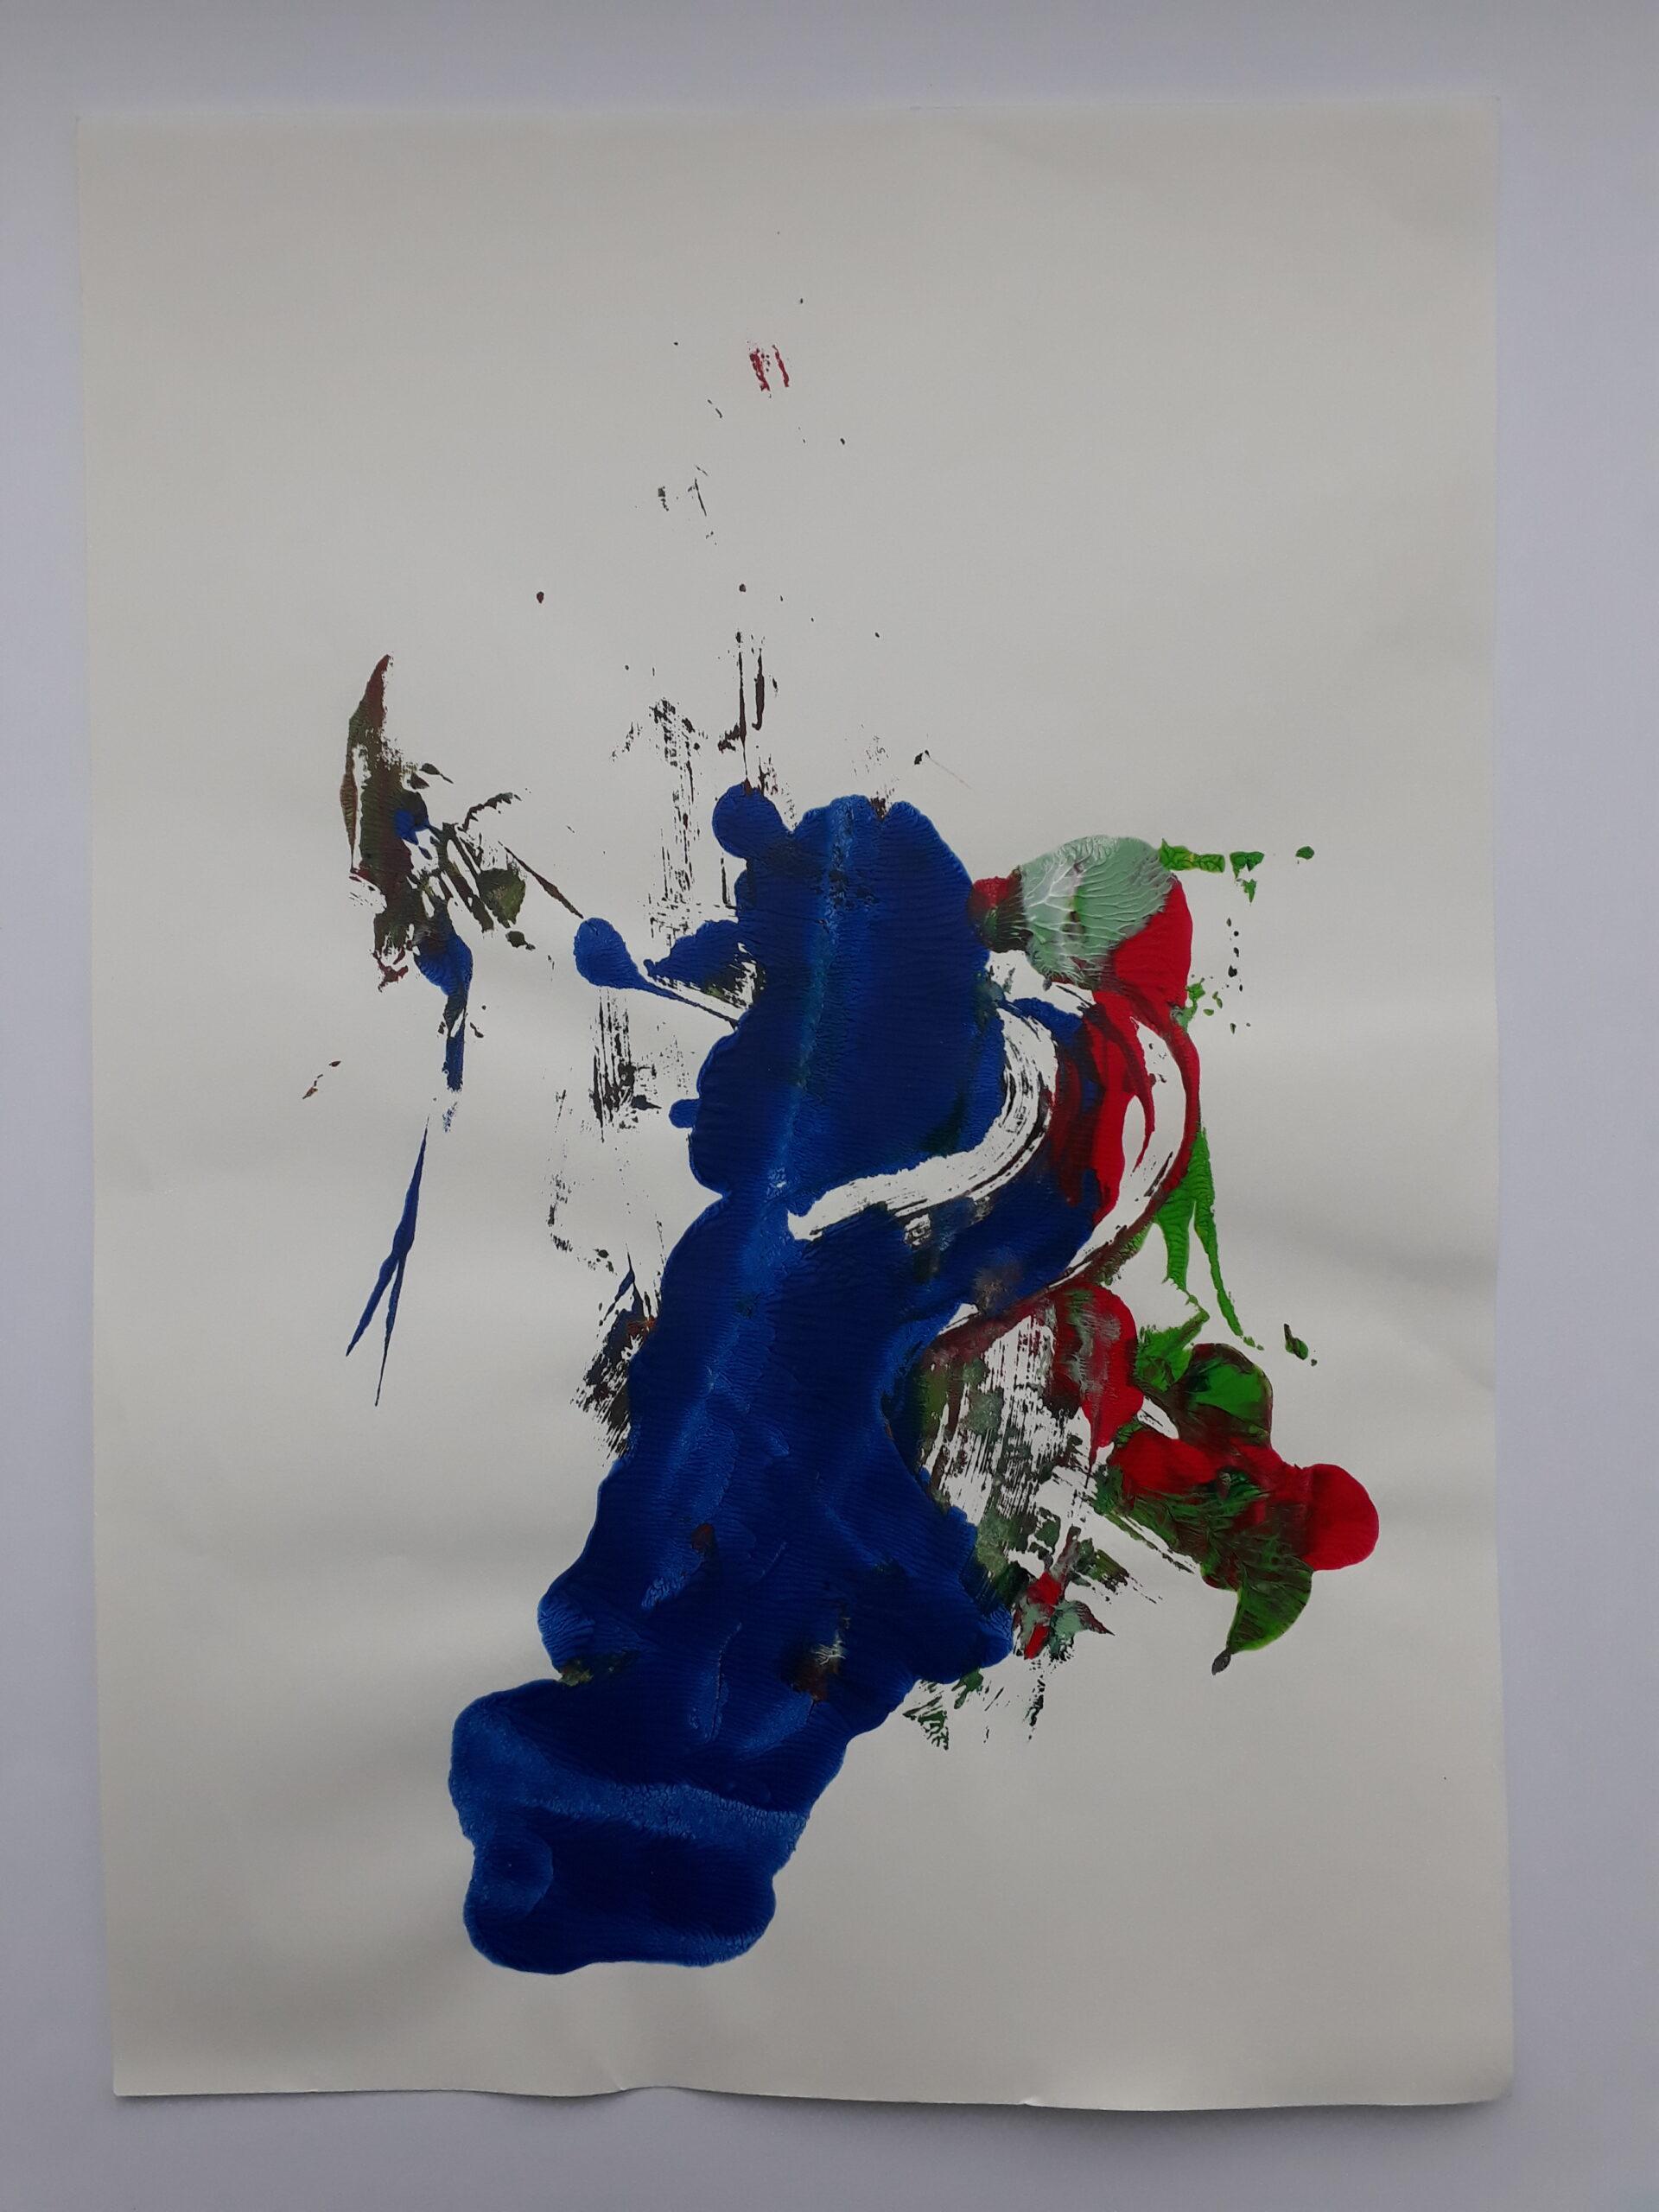 Deep Water Solo, 2019, Acryl auf Papier, 21x30cm